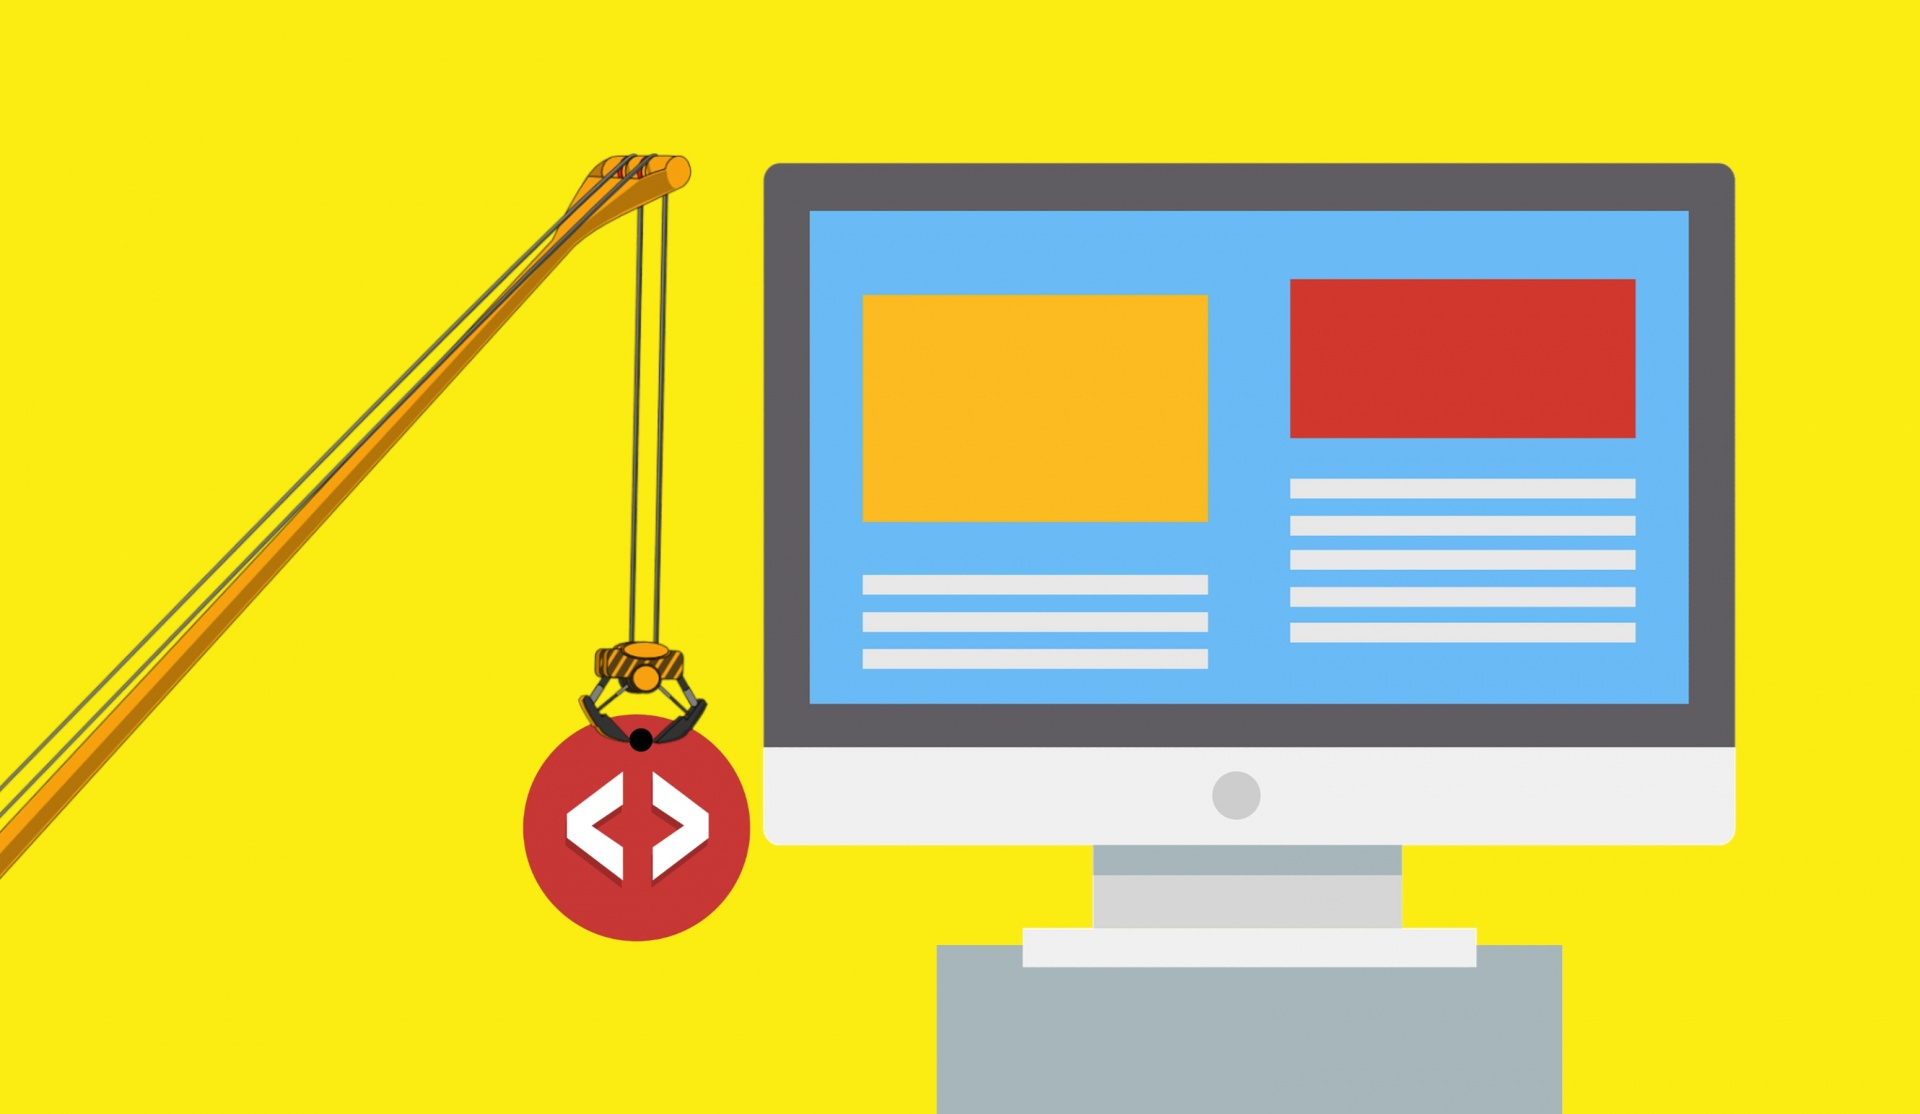 Web Development with PHP and MySQL